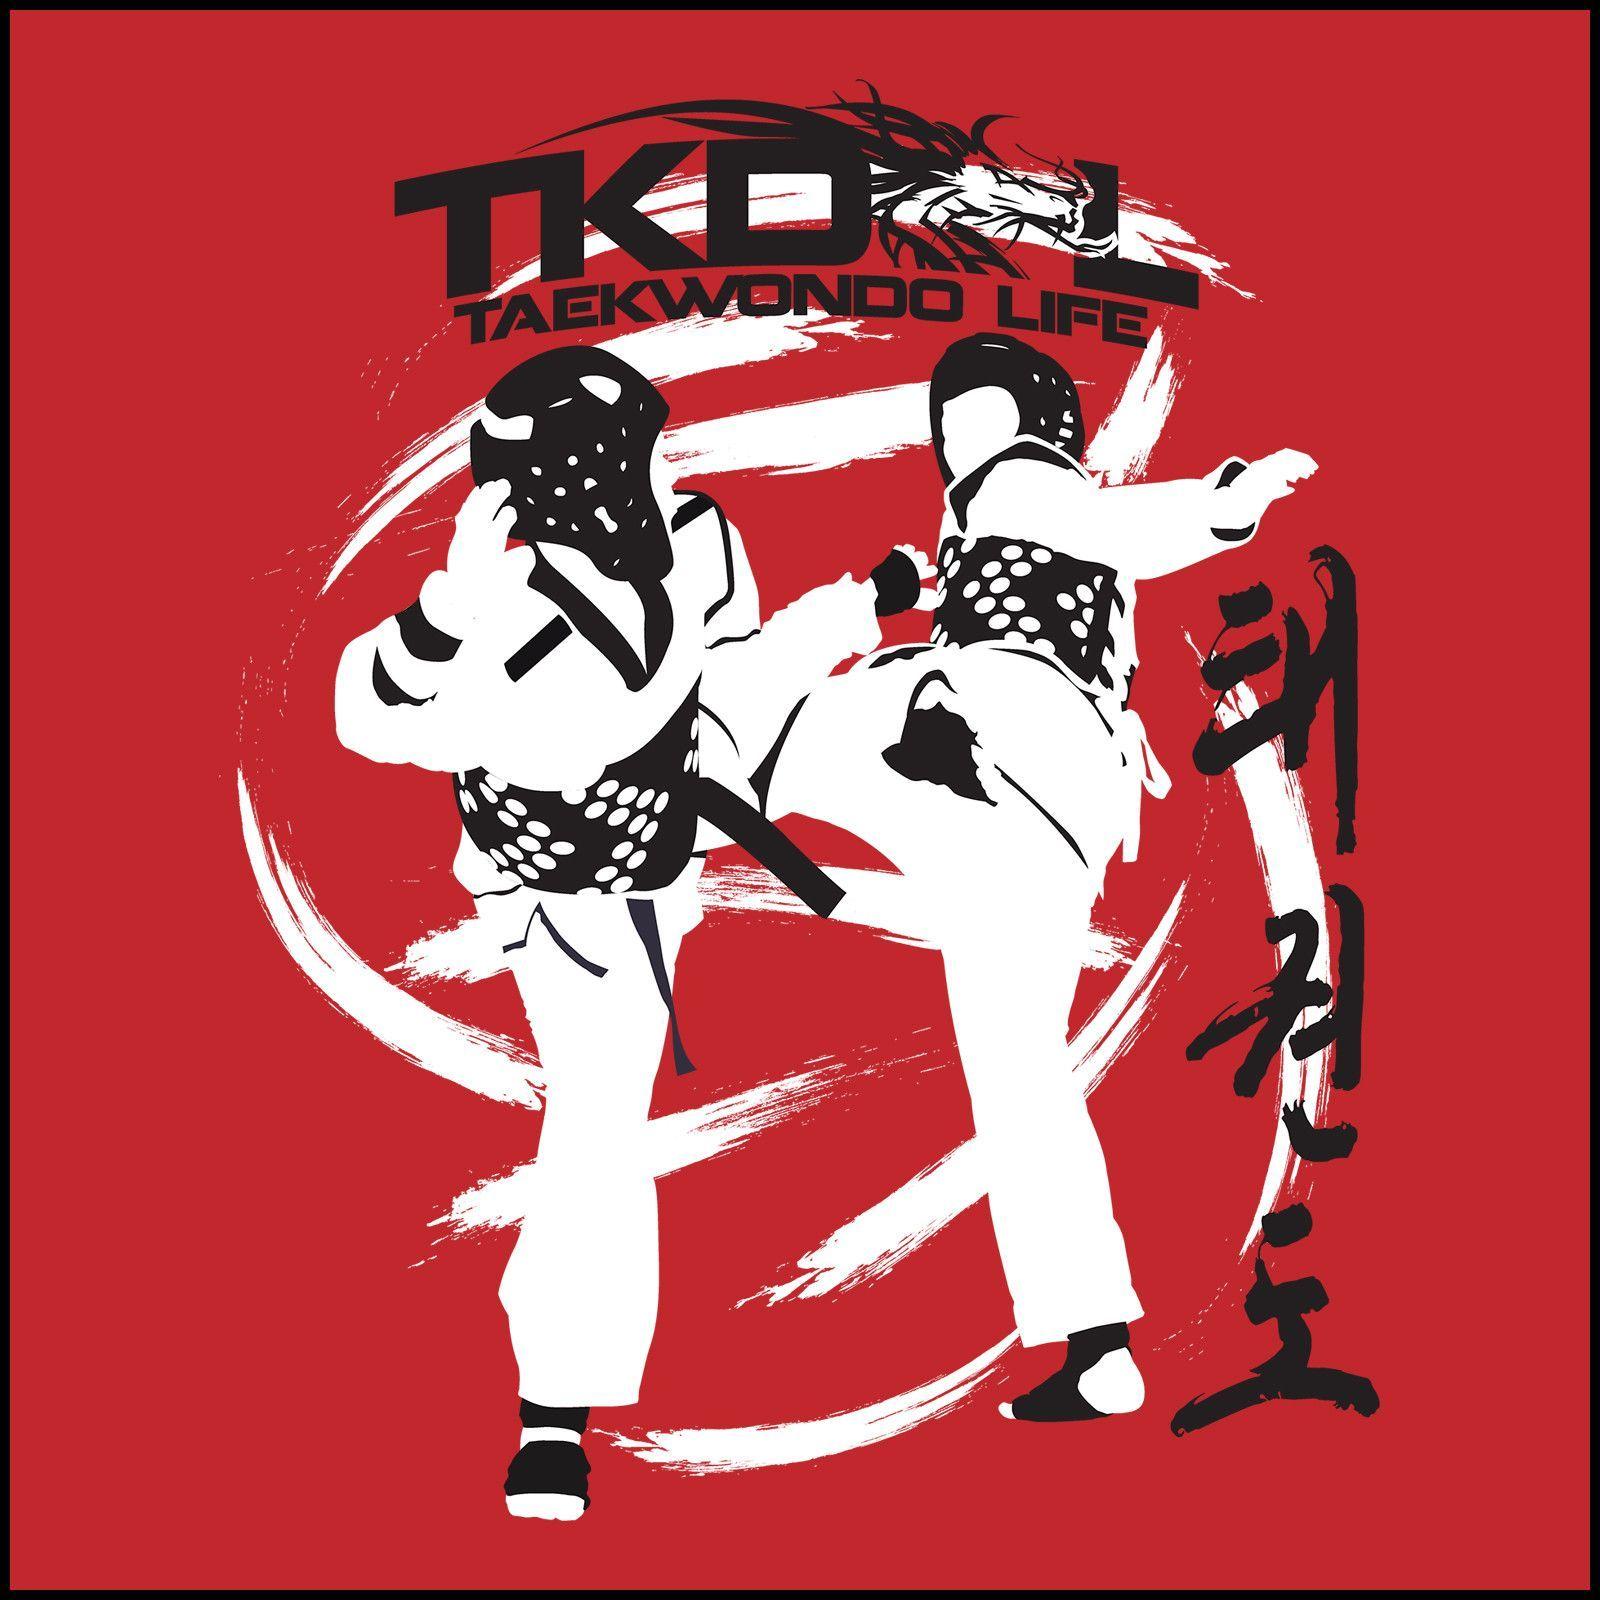 Taekwondo Quotes Spin Kicks Taekwondo Sst Tshirt  Bold Graphic Free Shipping